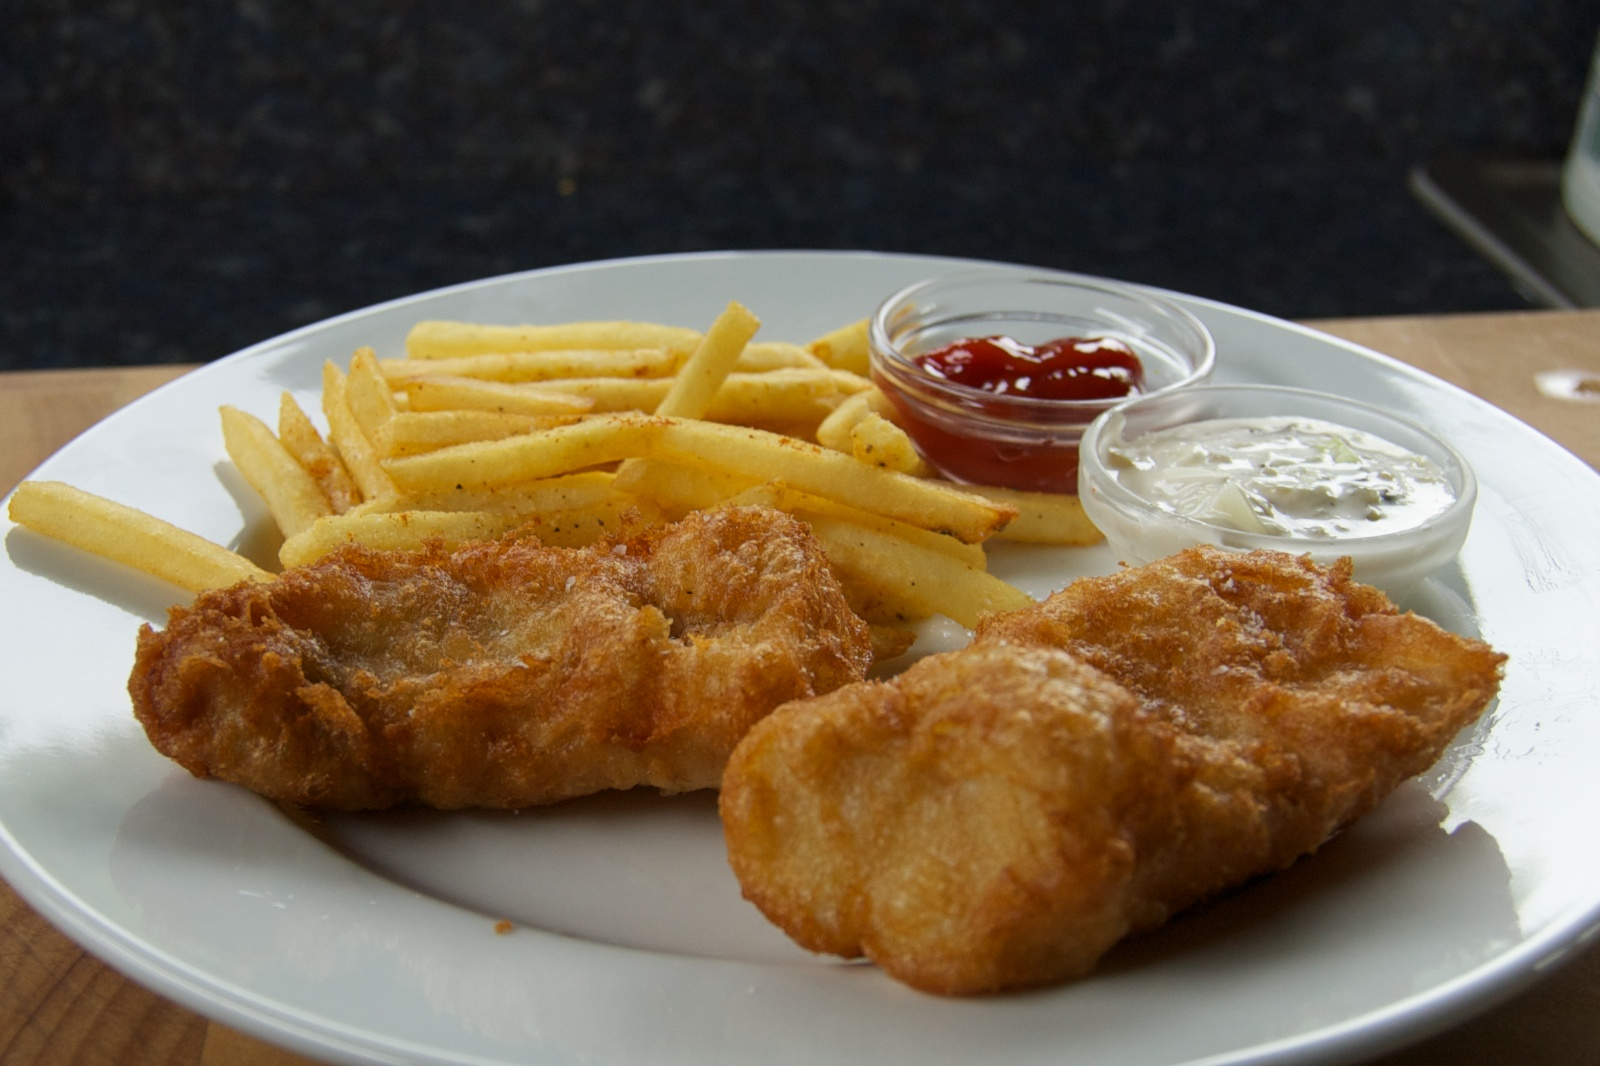 http://blog.rickk.com/food/2011/08/27/ate.2011.08.27.d.jpg